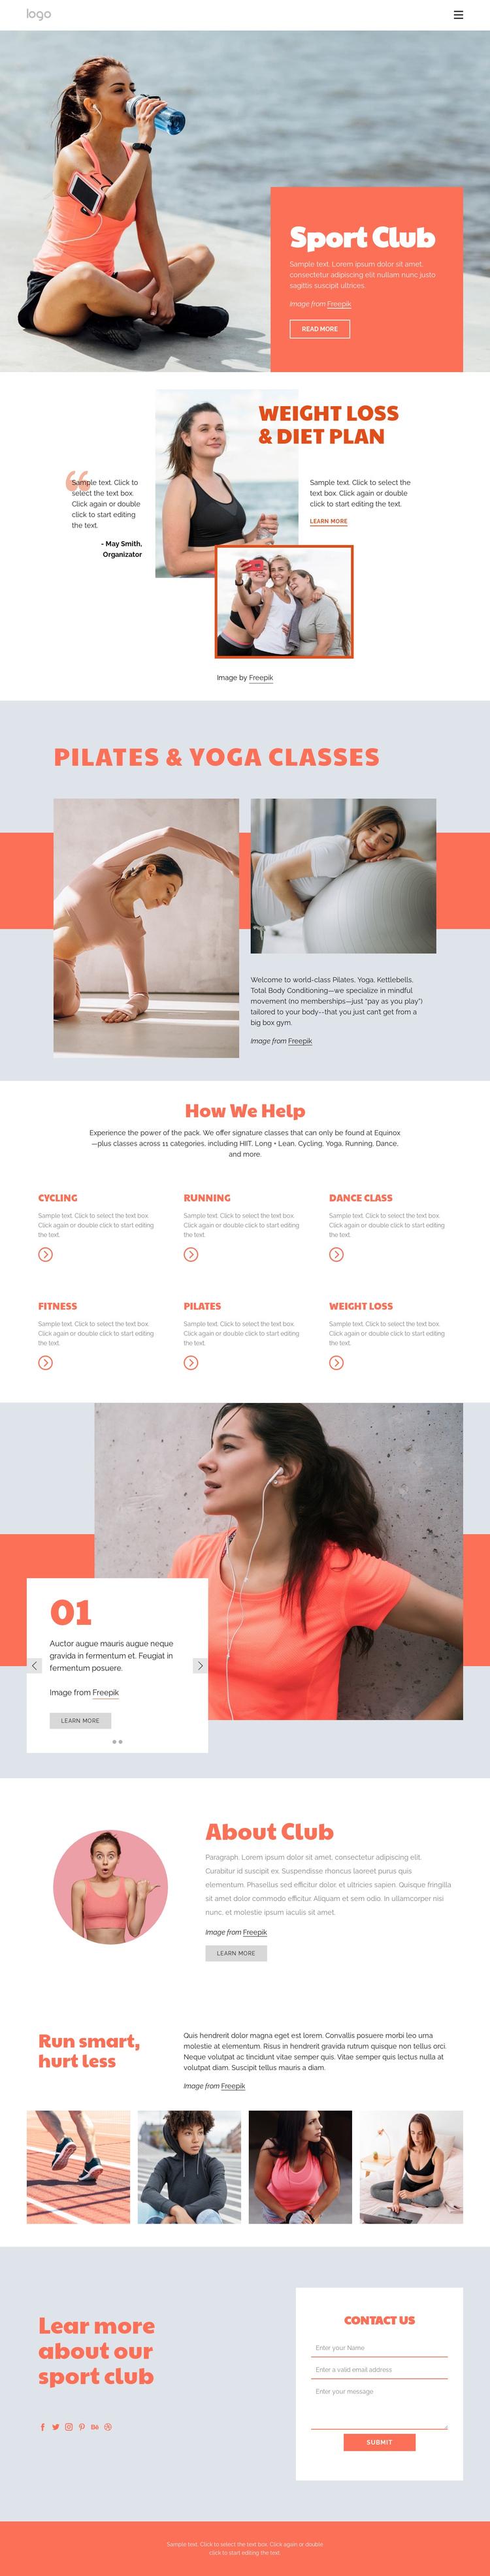 Pilates vs yoga Website Builder Software